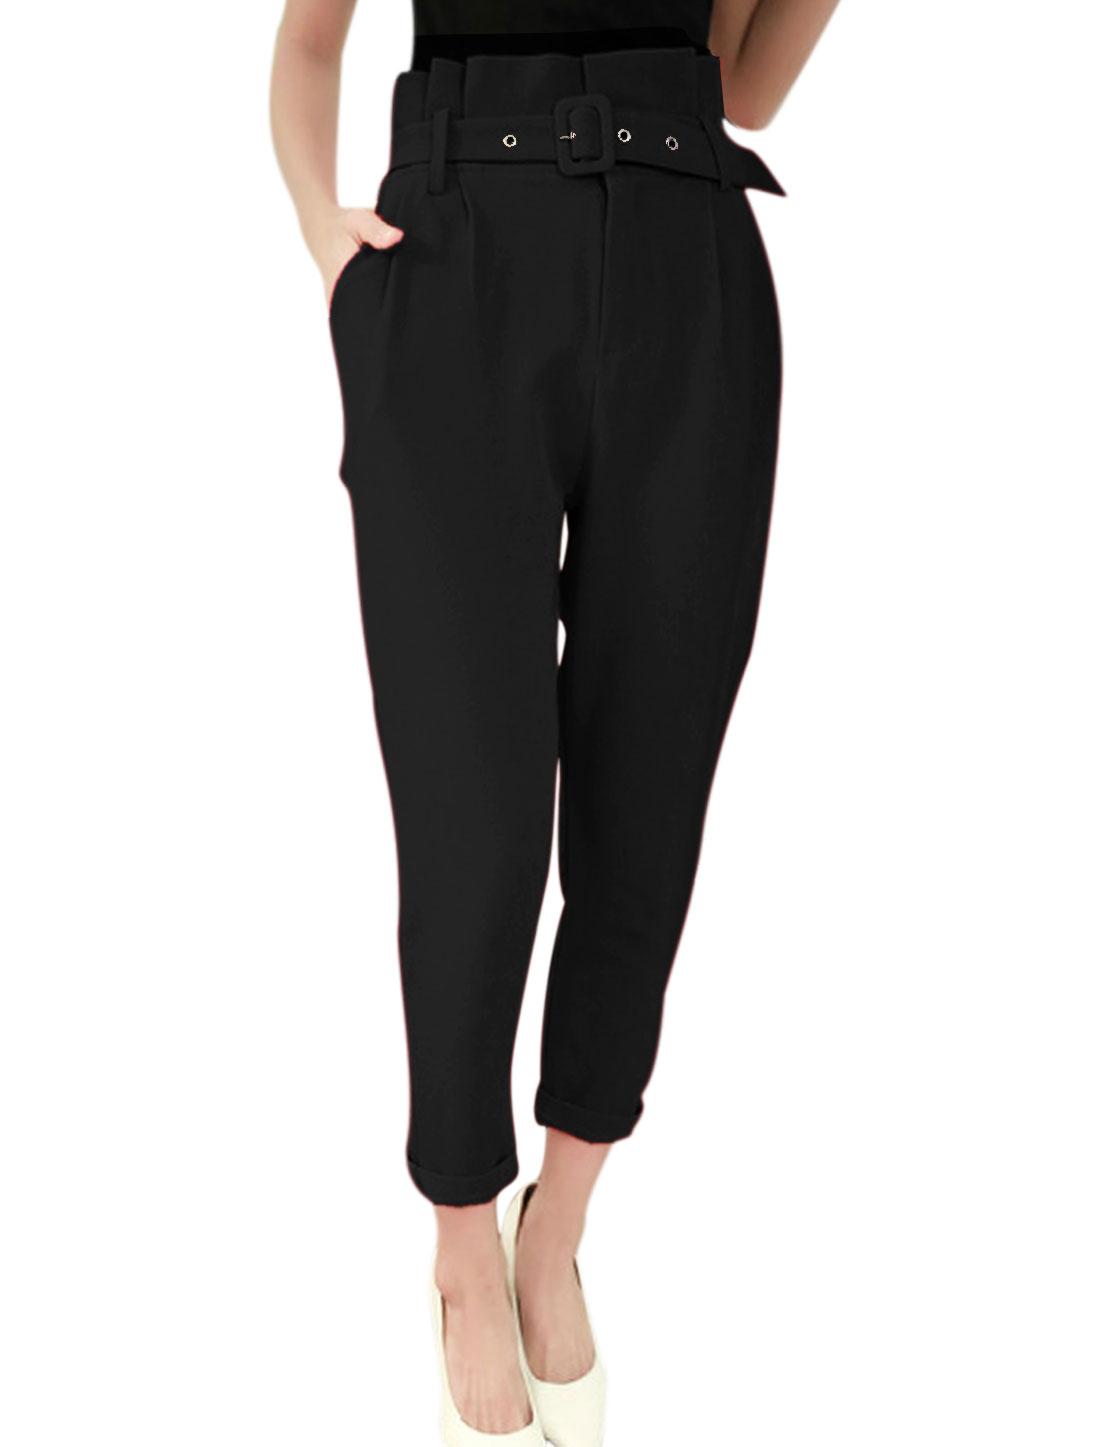 Women High Waist Pleated Detail Fashion Cropped Pants w Belt Black S